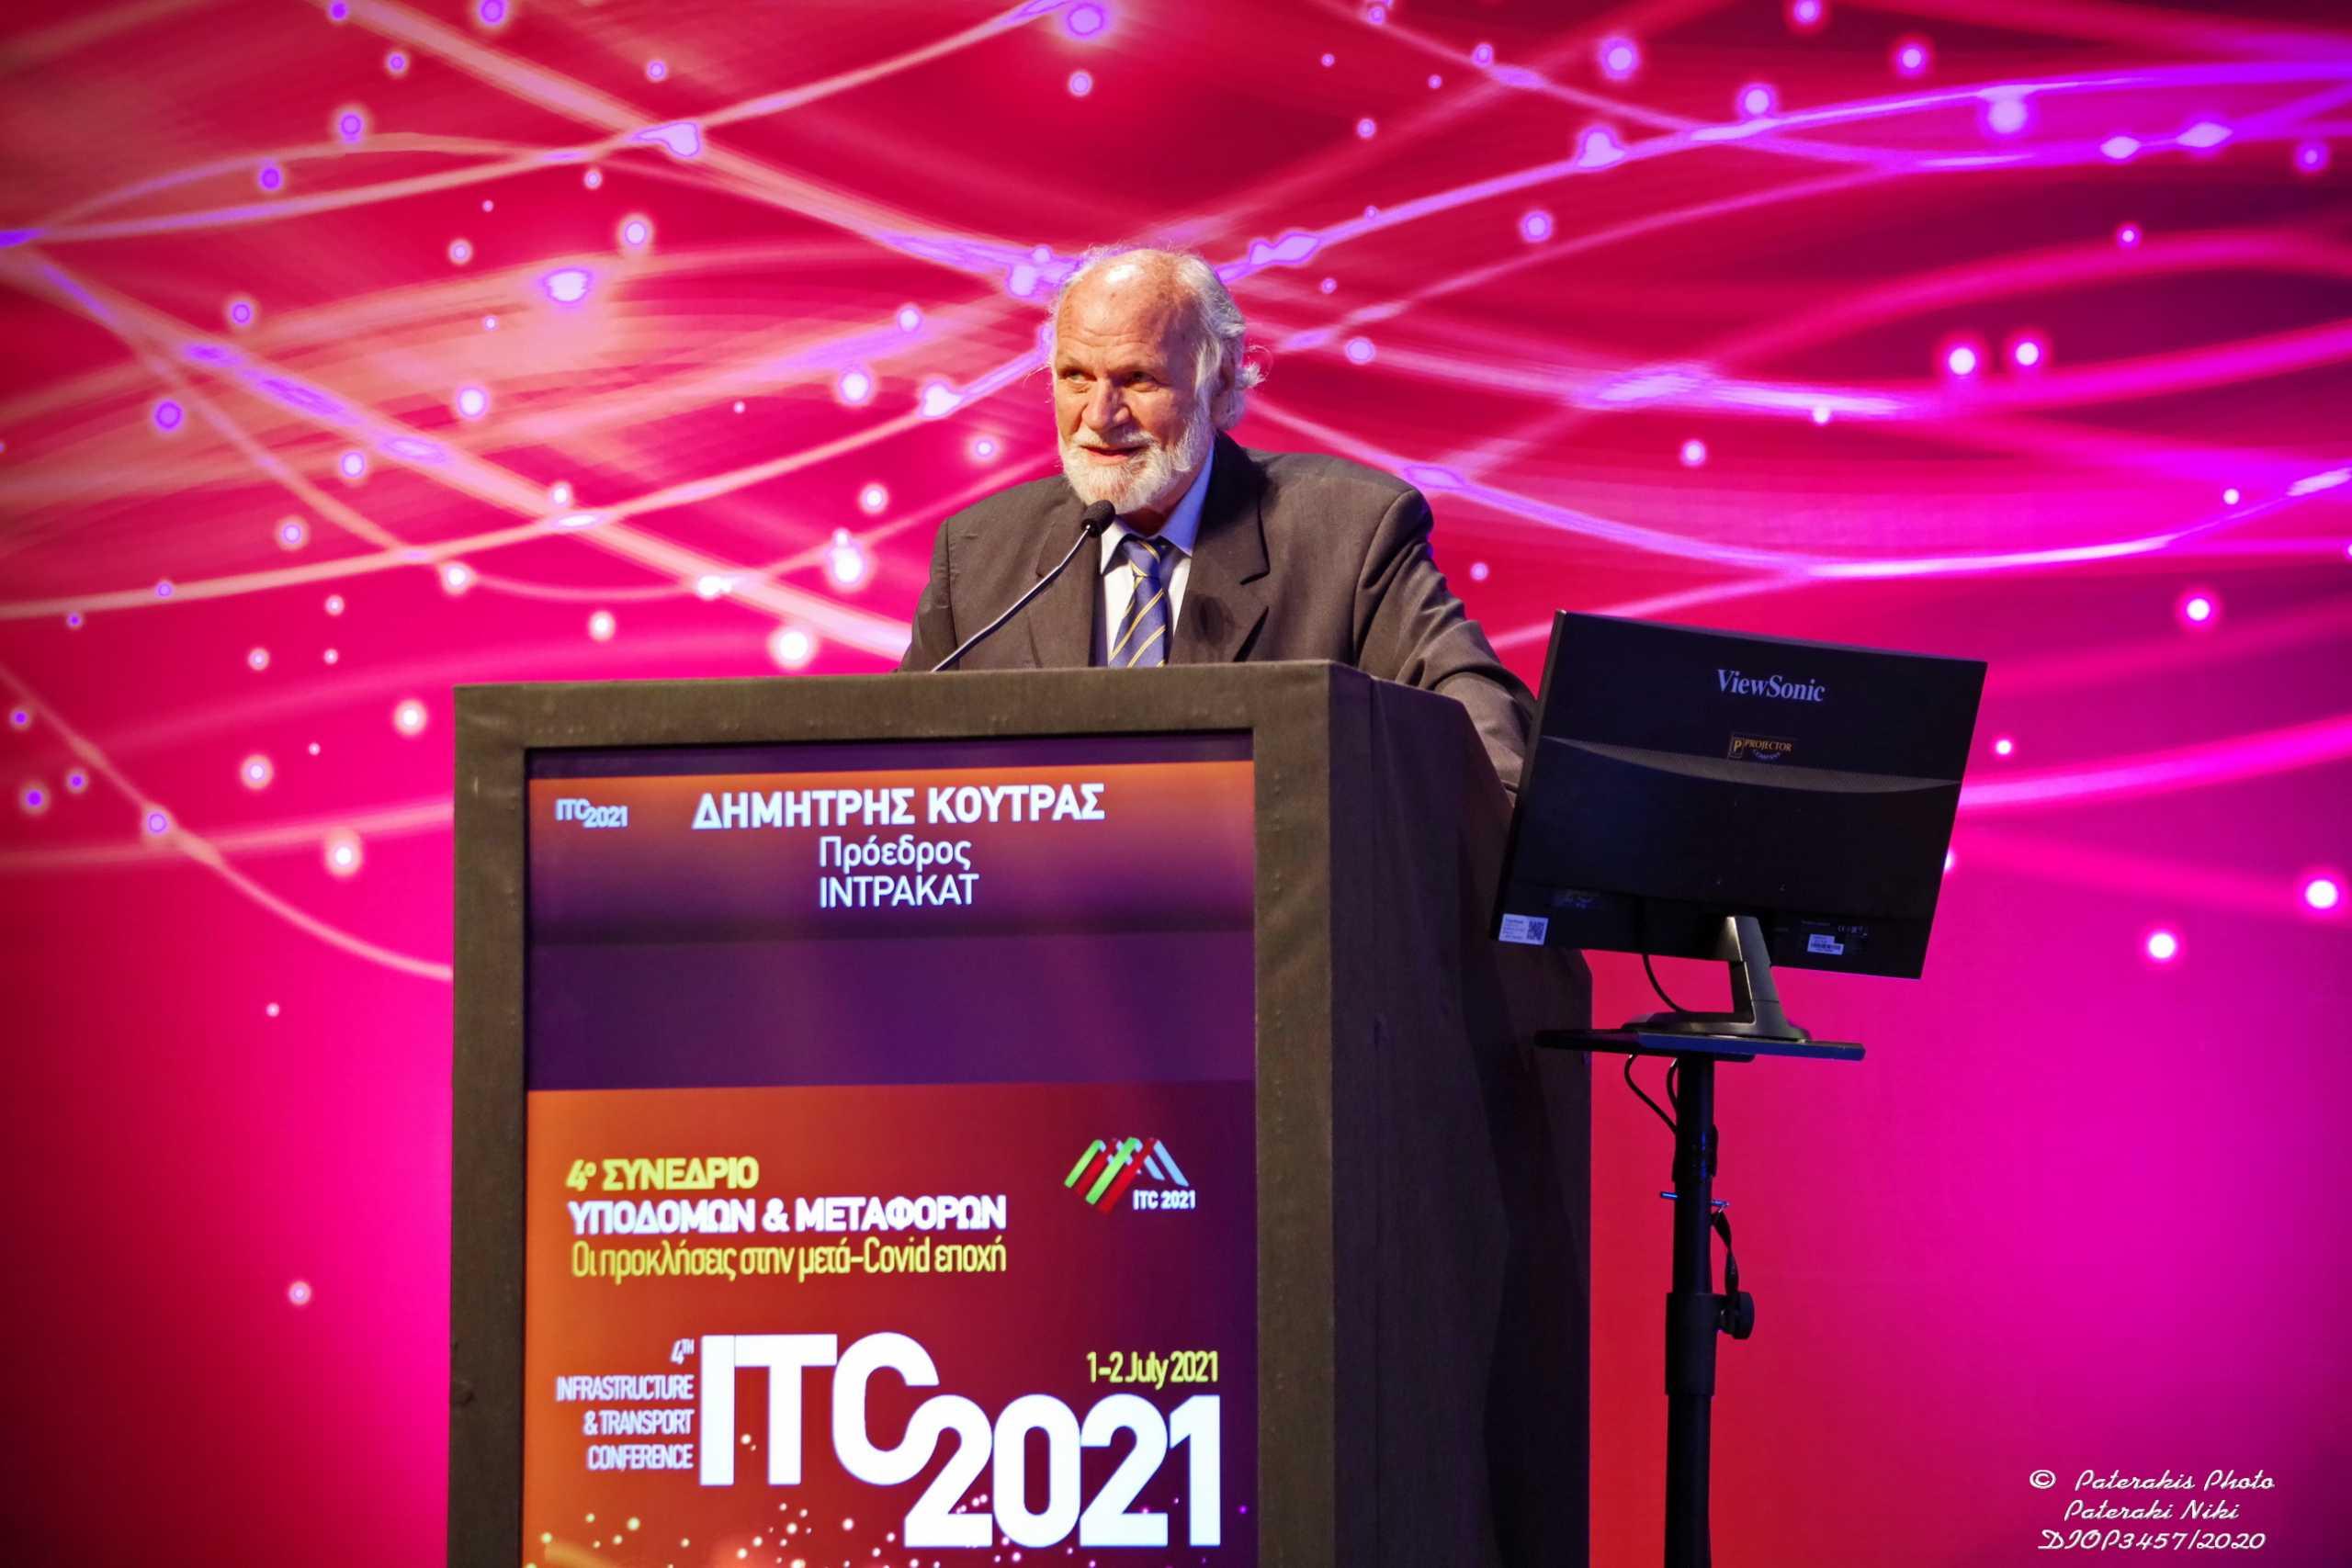 Intrakat: Η βράβευση και το μήνυμα αισιοδοξίας από το 4ο Συνέδριο Υποδομών και Μεταφορών